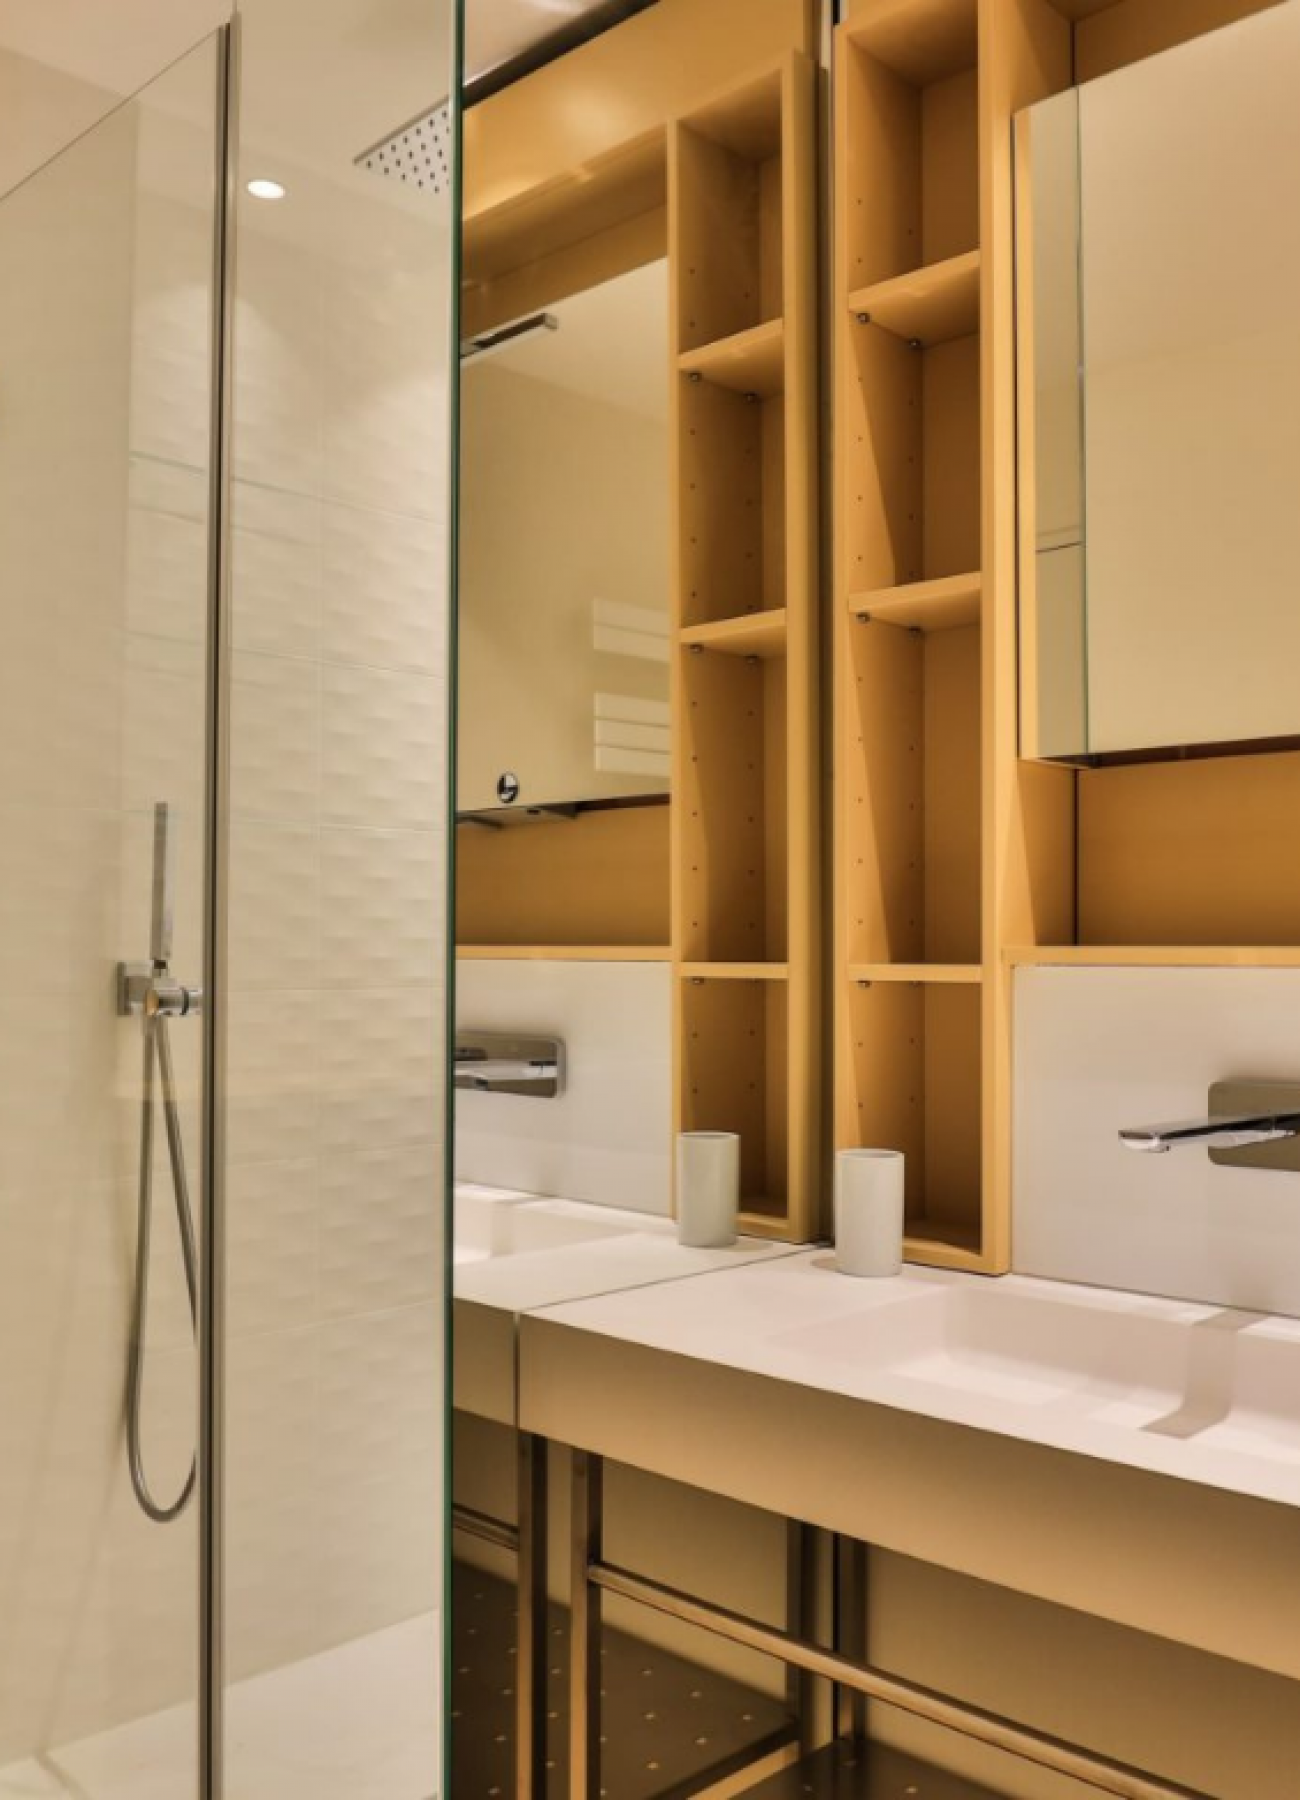 Salle de bain - Adour Gestion Locative